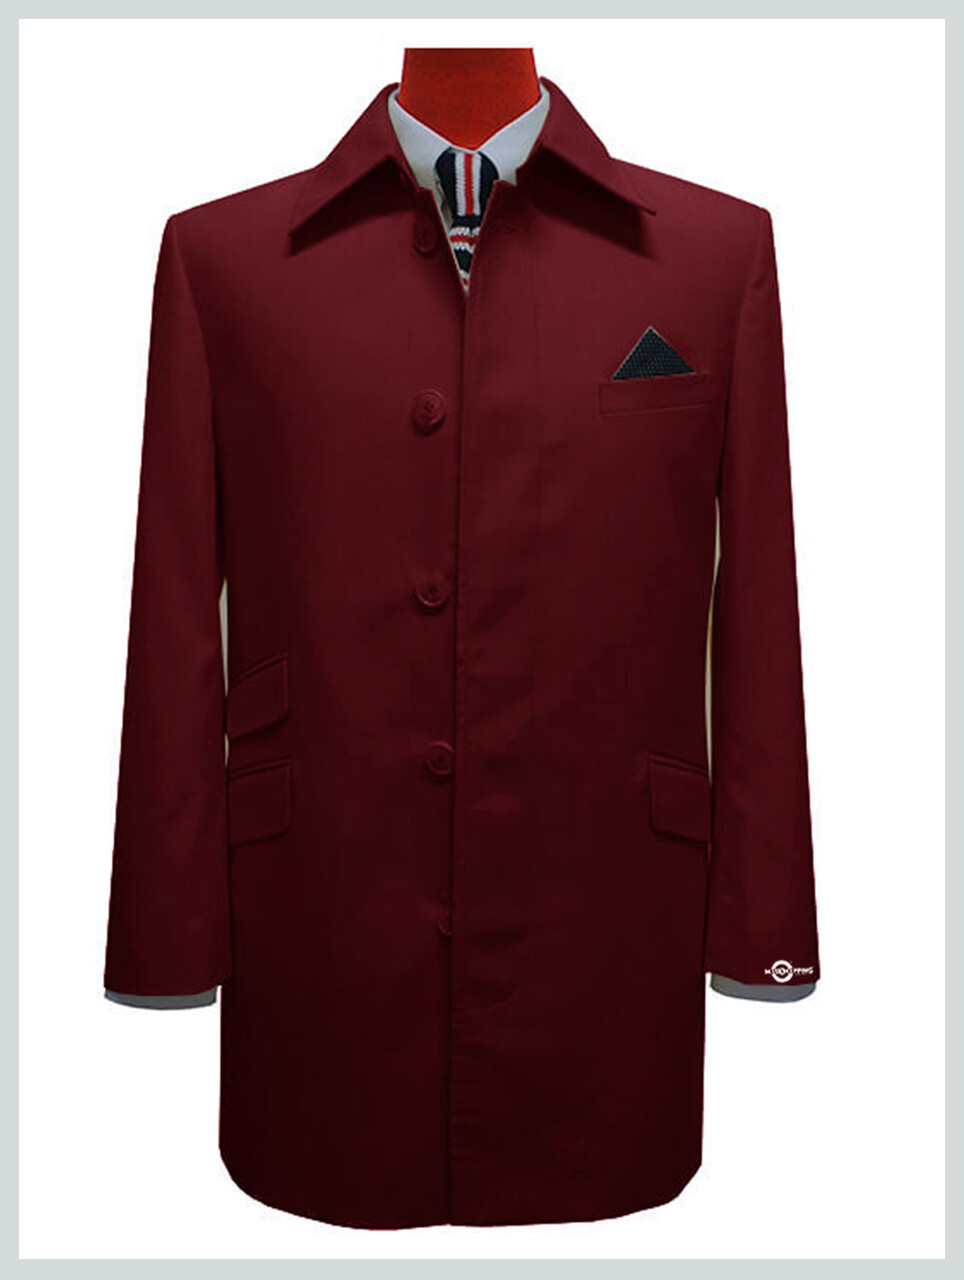 Mac Coat Mens| Burgundy Retro Mod Mac Coat For Men